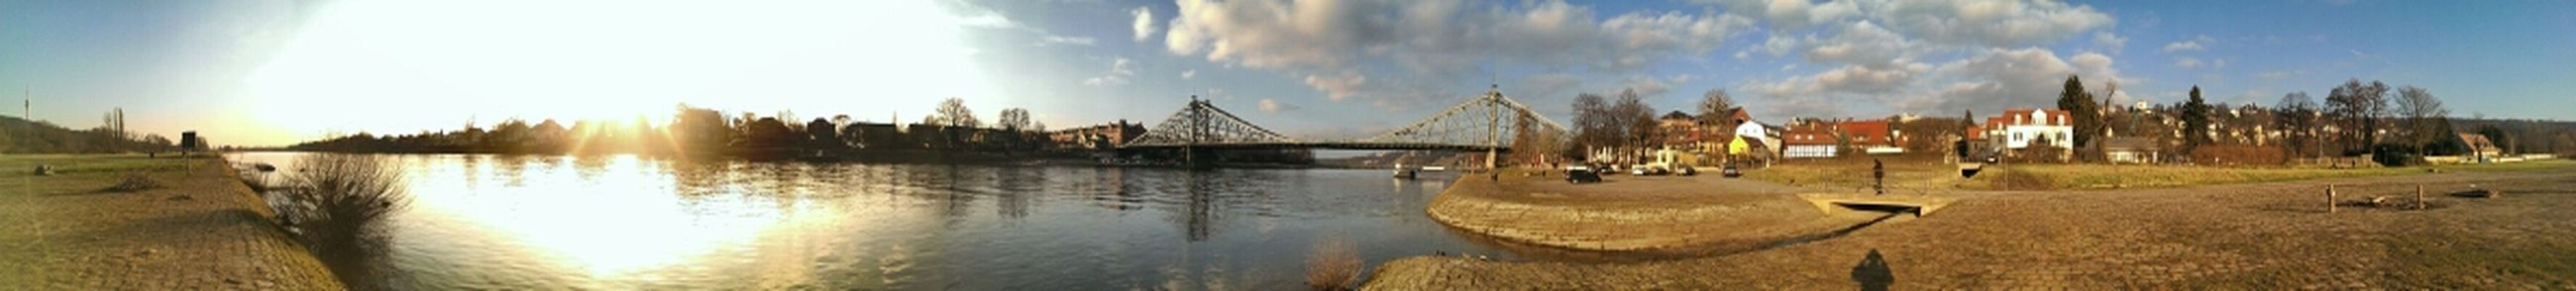 Elbe Panorama Bridge Nature_collection